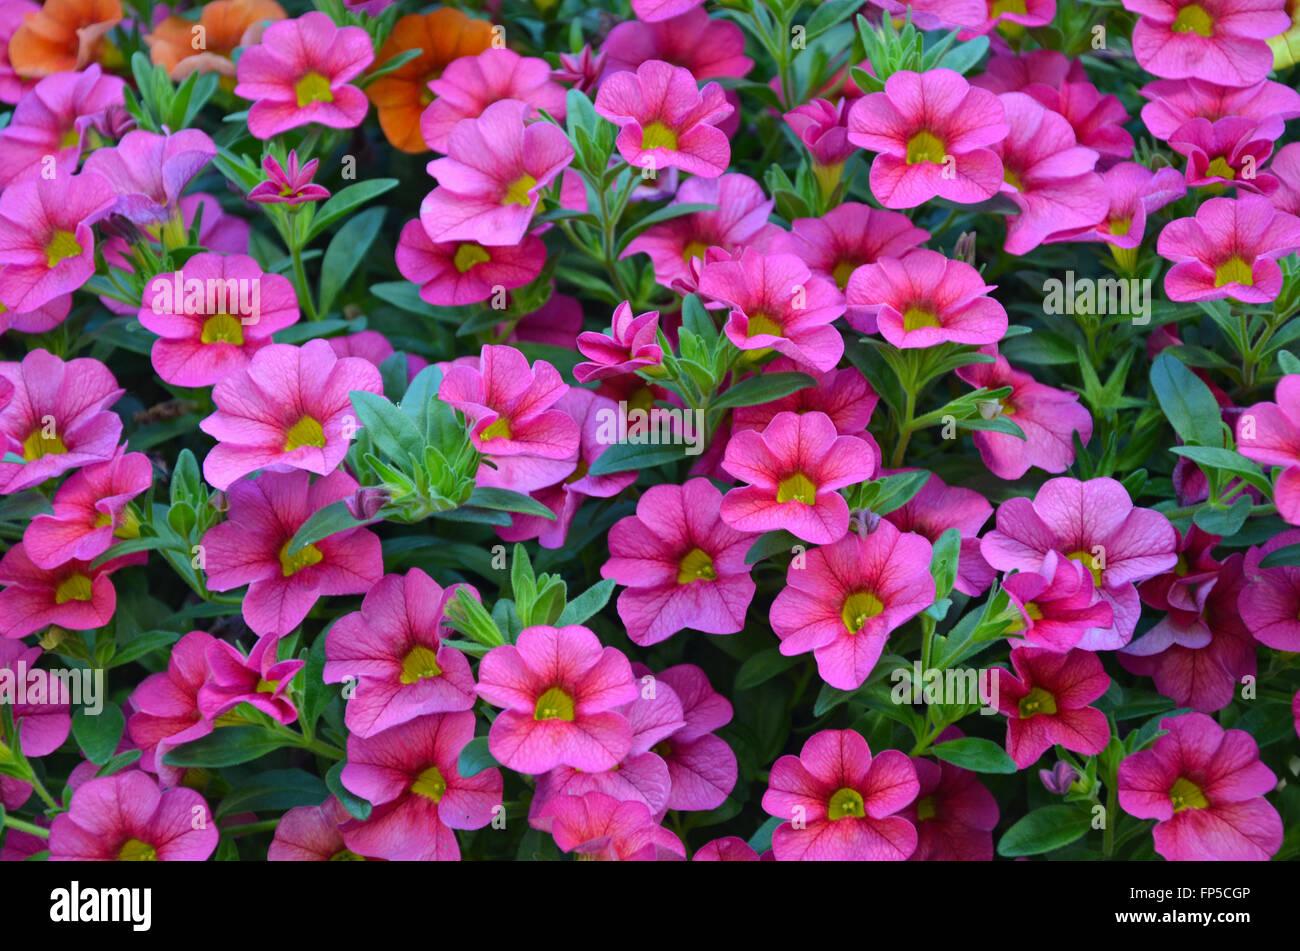 Beautiful Pink Small Petunia Flowers In Hanging Basket